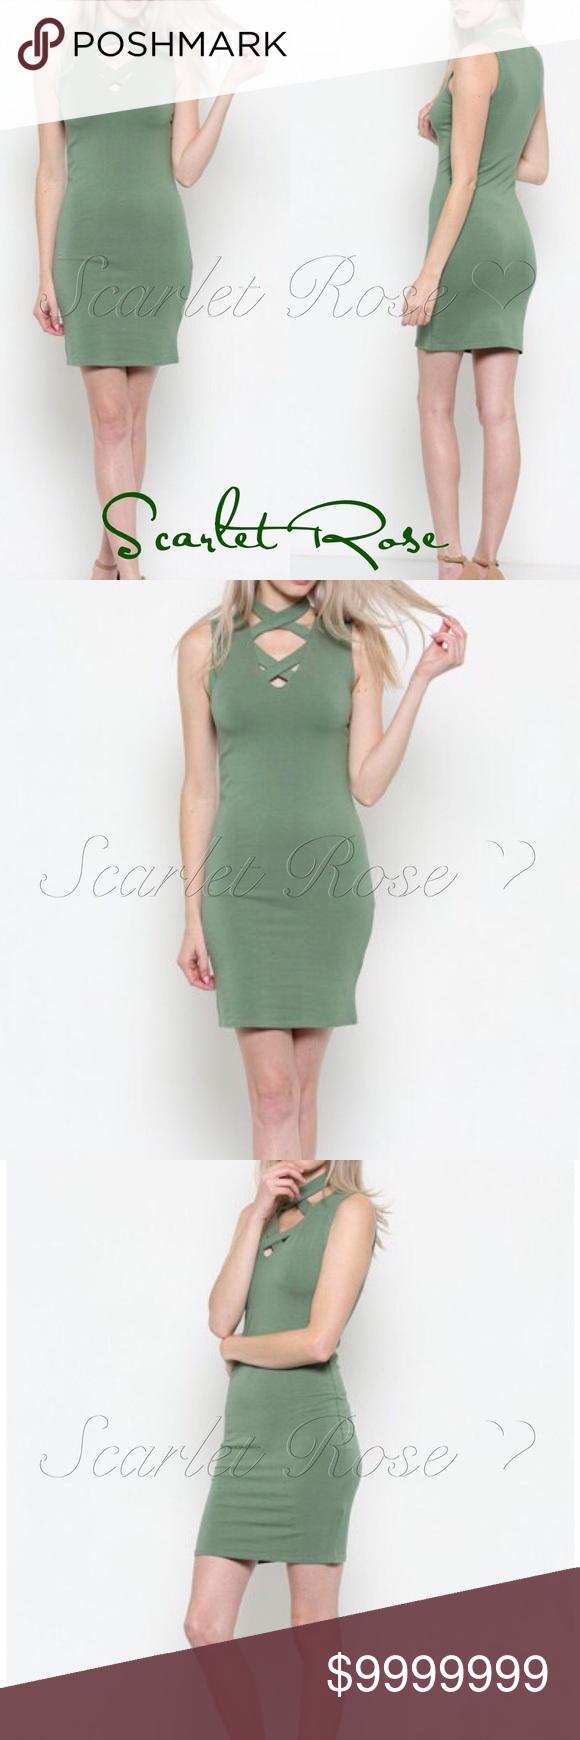 Heels for dark green dress  COMING SOON Dark Sage Mini Dresses COMING SOON